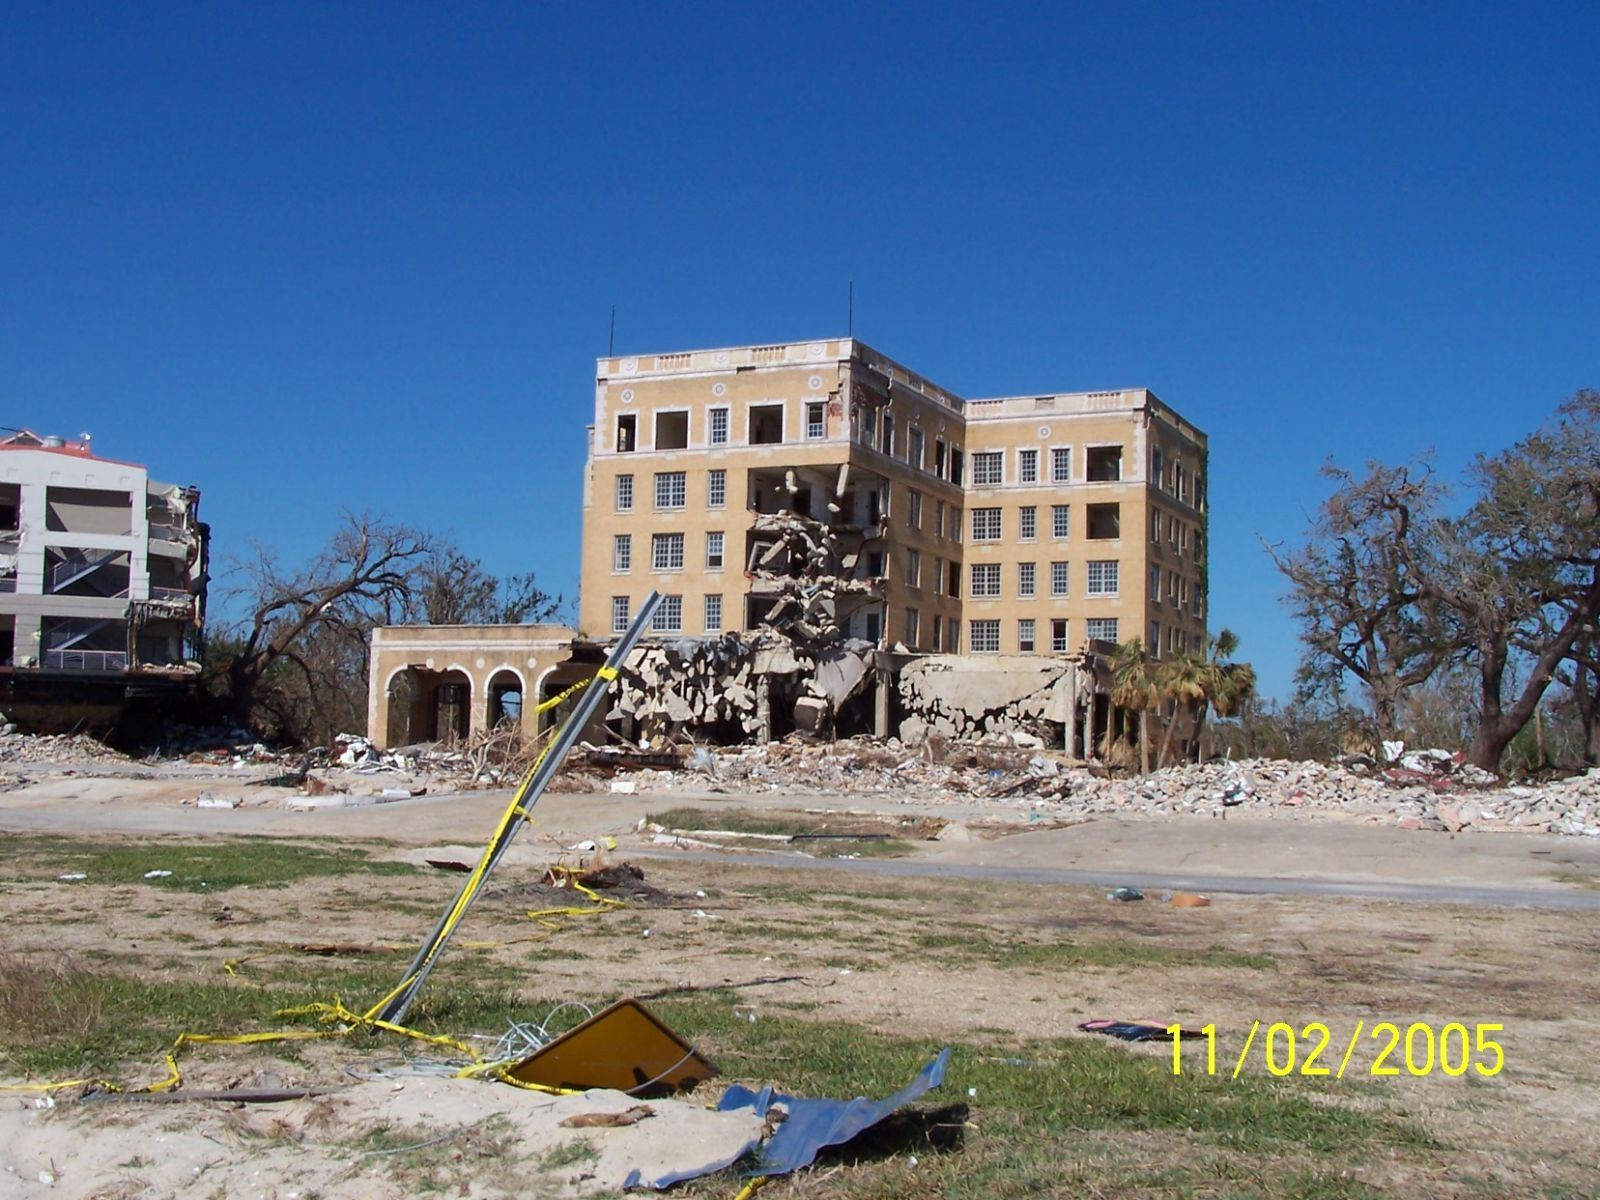 Nws New Orleans Baton Rouge 15th Anniversary Of Hurricane Katrina